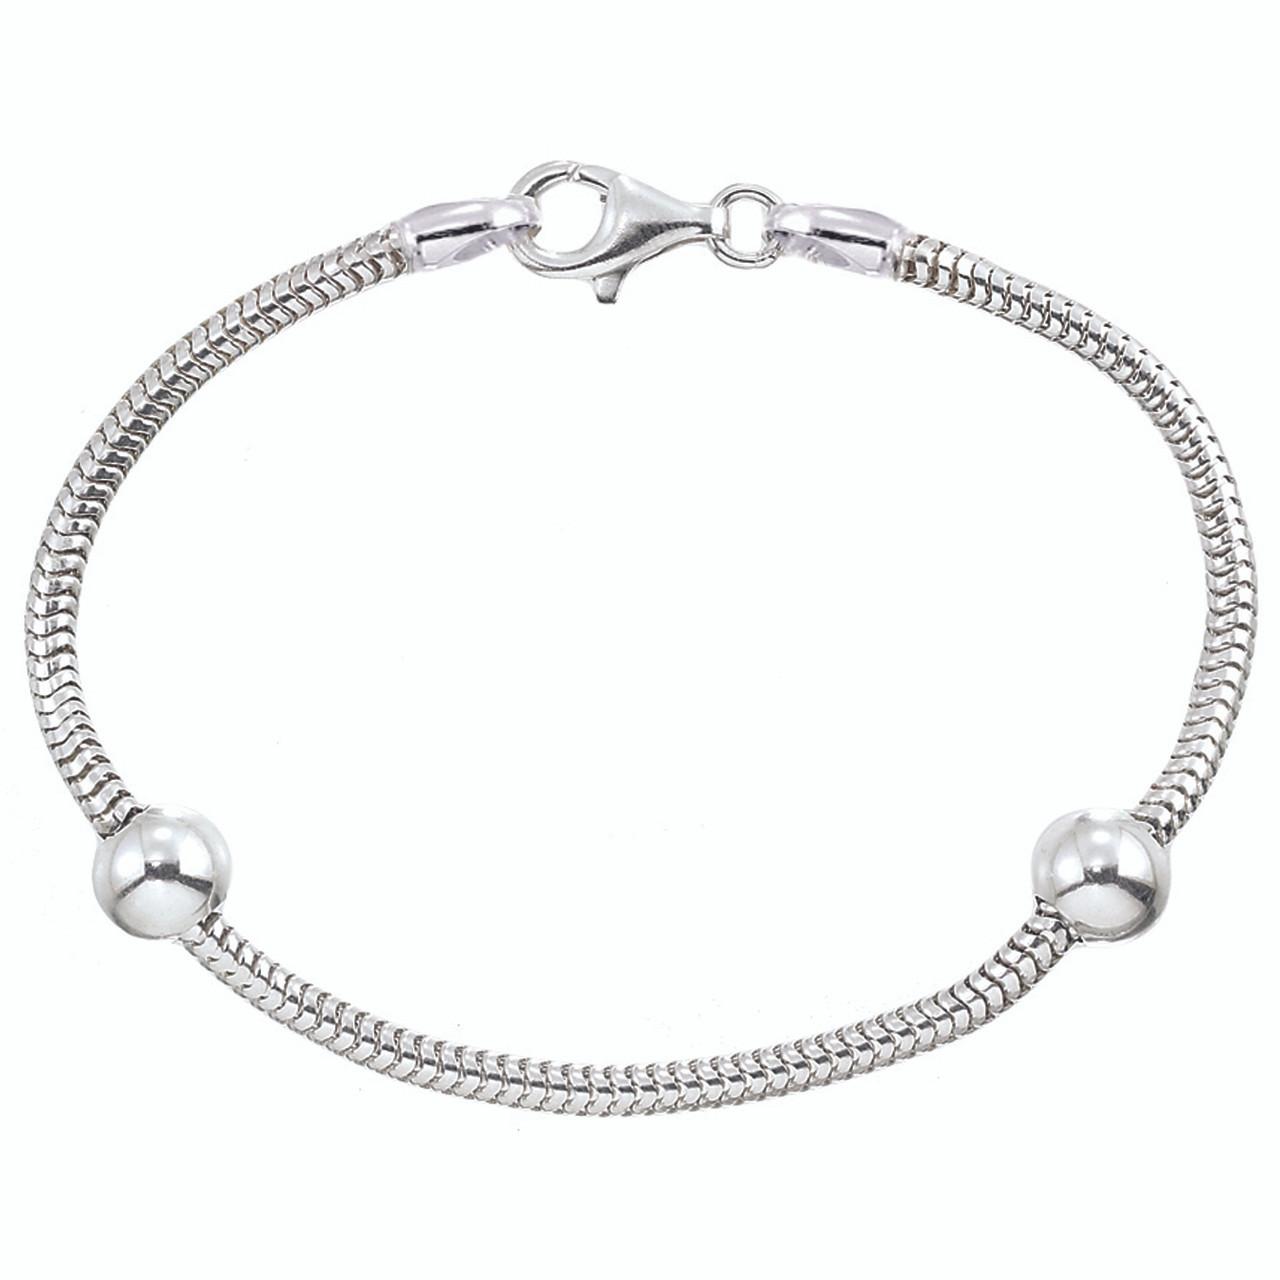 grand assortiment vaste gamme de 100% qualité garantie ZABLE Smart Starter Bracelet & 2 Stopper Beads